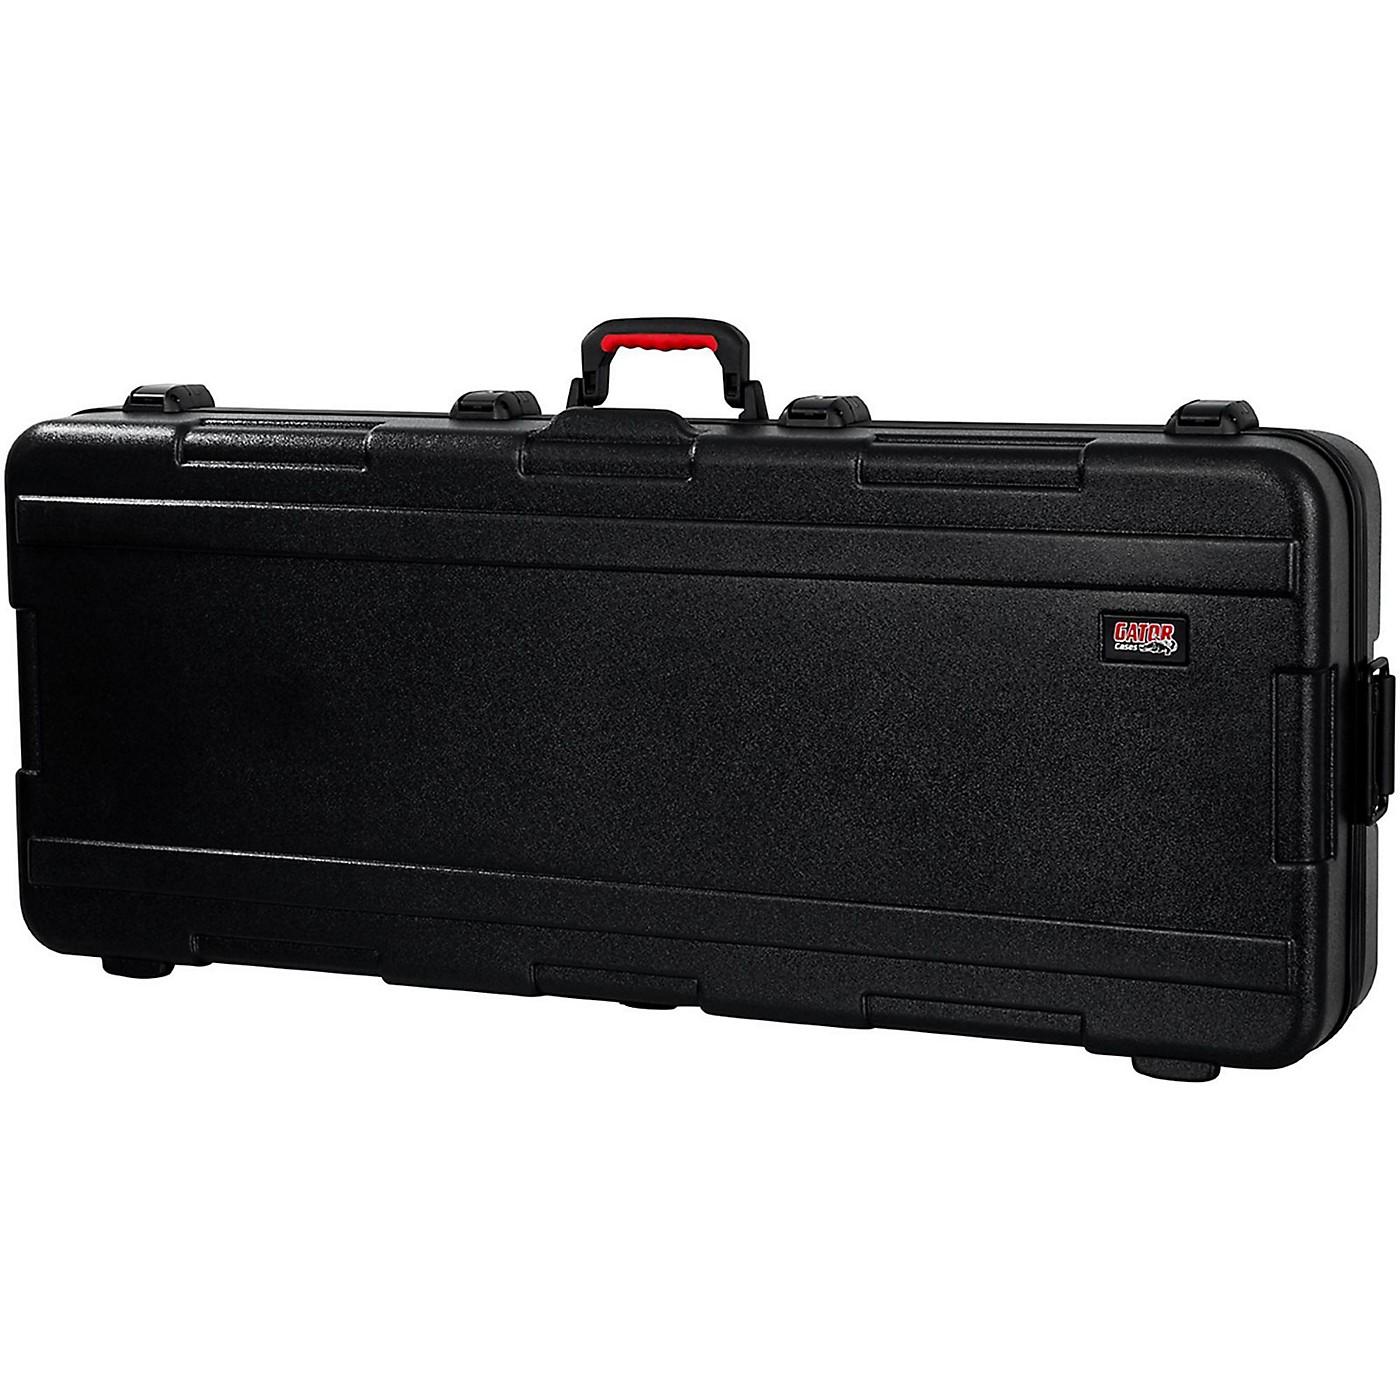 Gator TSA ATA Slim 88-Note Keyboard Case with Wheels thumbnail